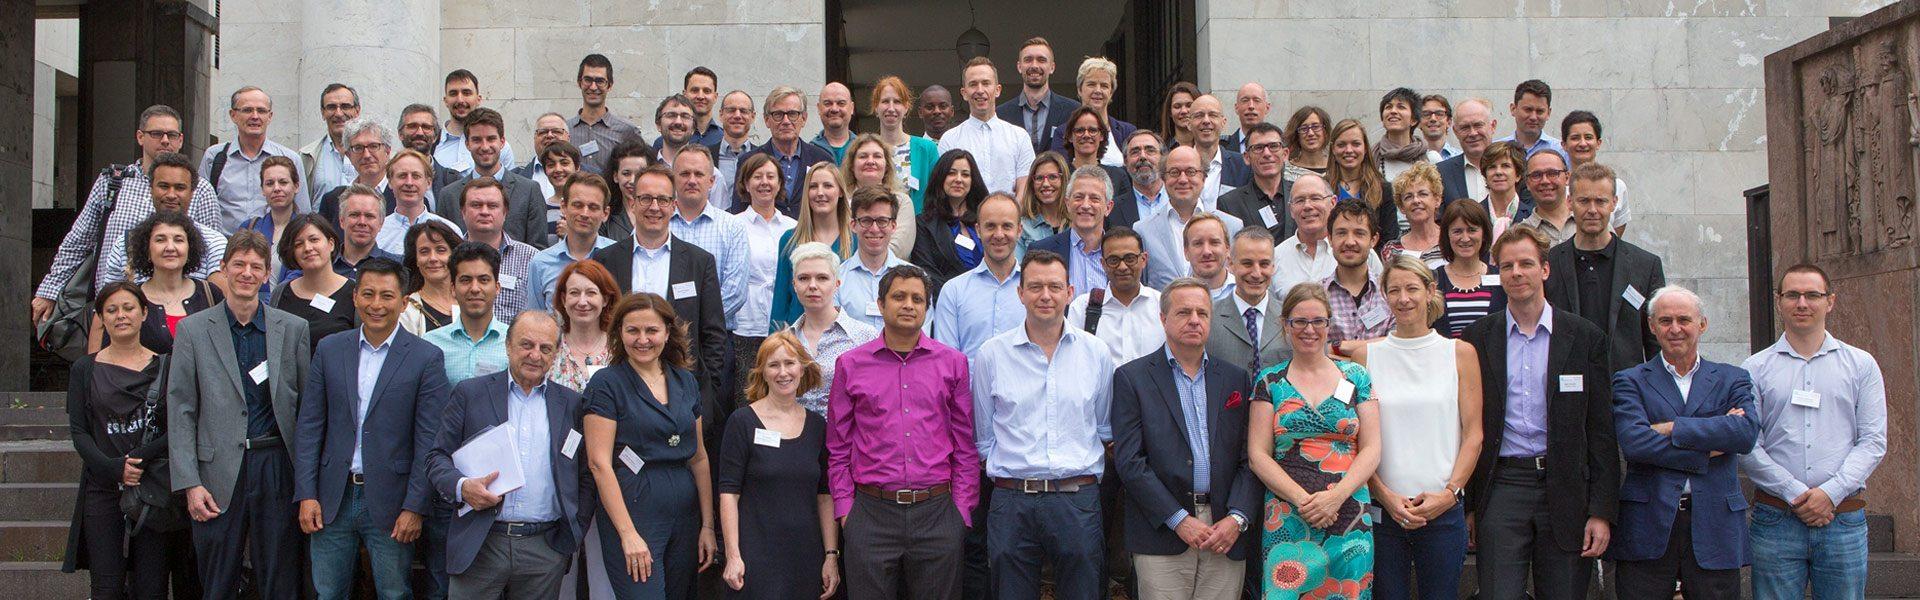 RADAR-CNS Team - Epilepsy Alliance Europe